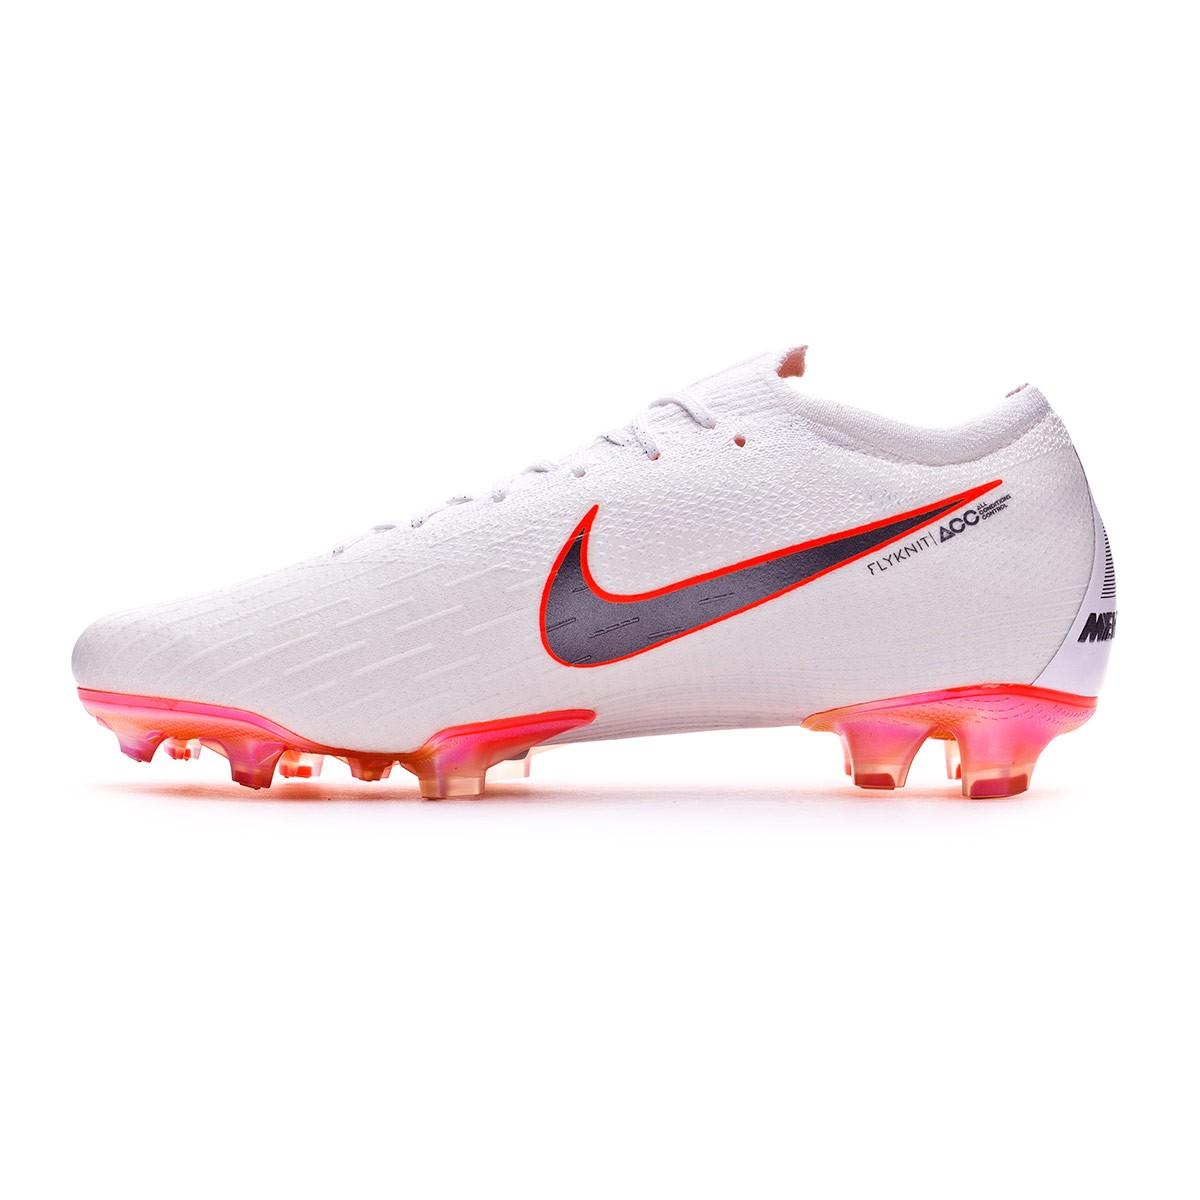 09f1b7a229fb30 Football Boots Nike Mercurial Vapor XII Elite FG White-Metallic cool  grey-Total orange - Football store Fútbol Emotion